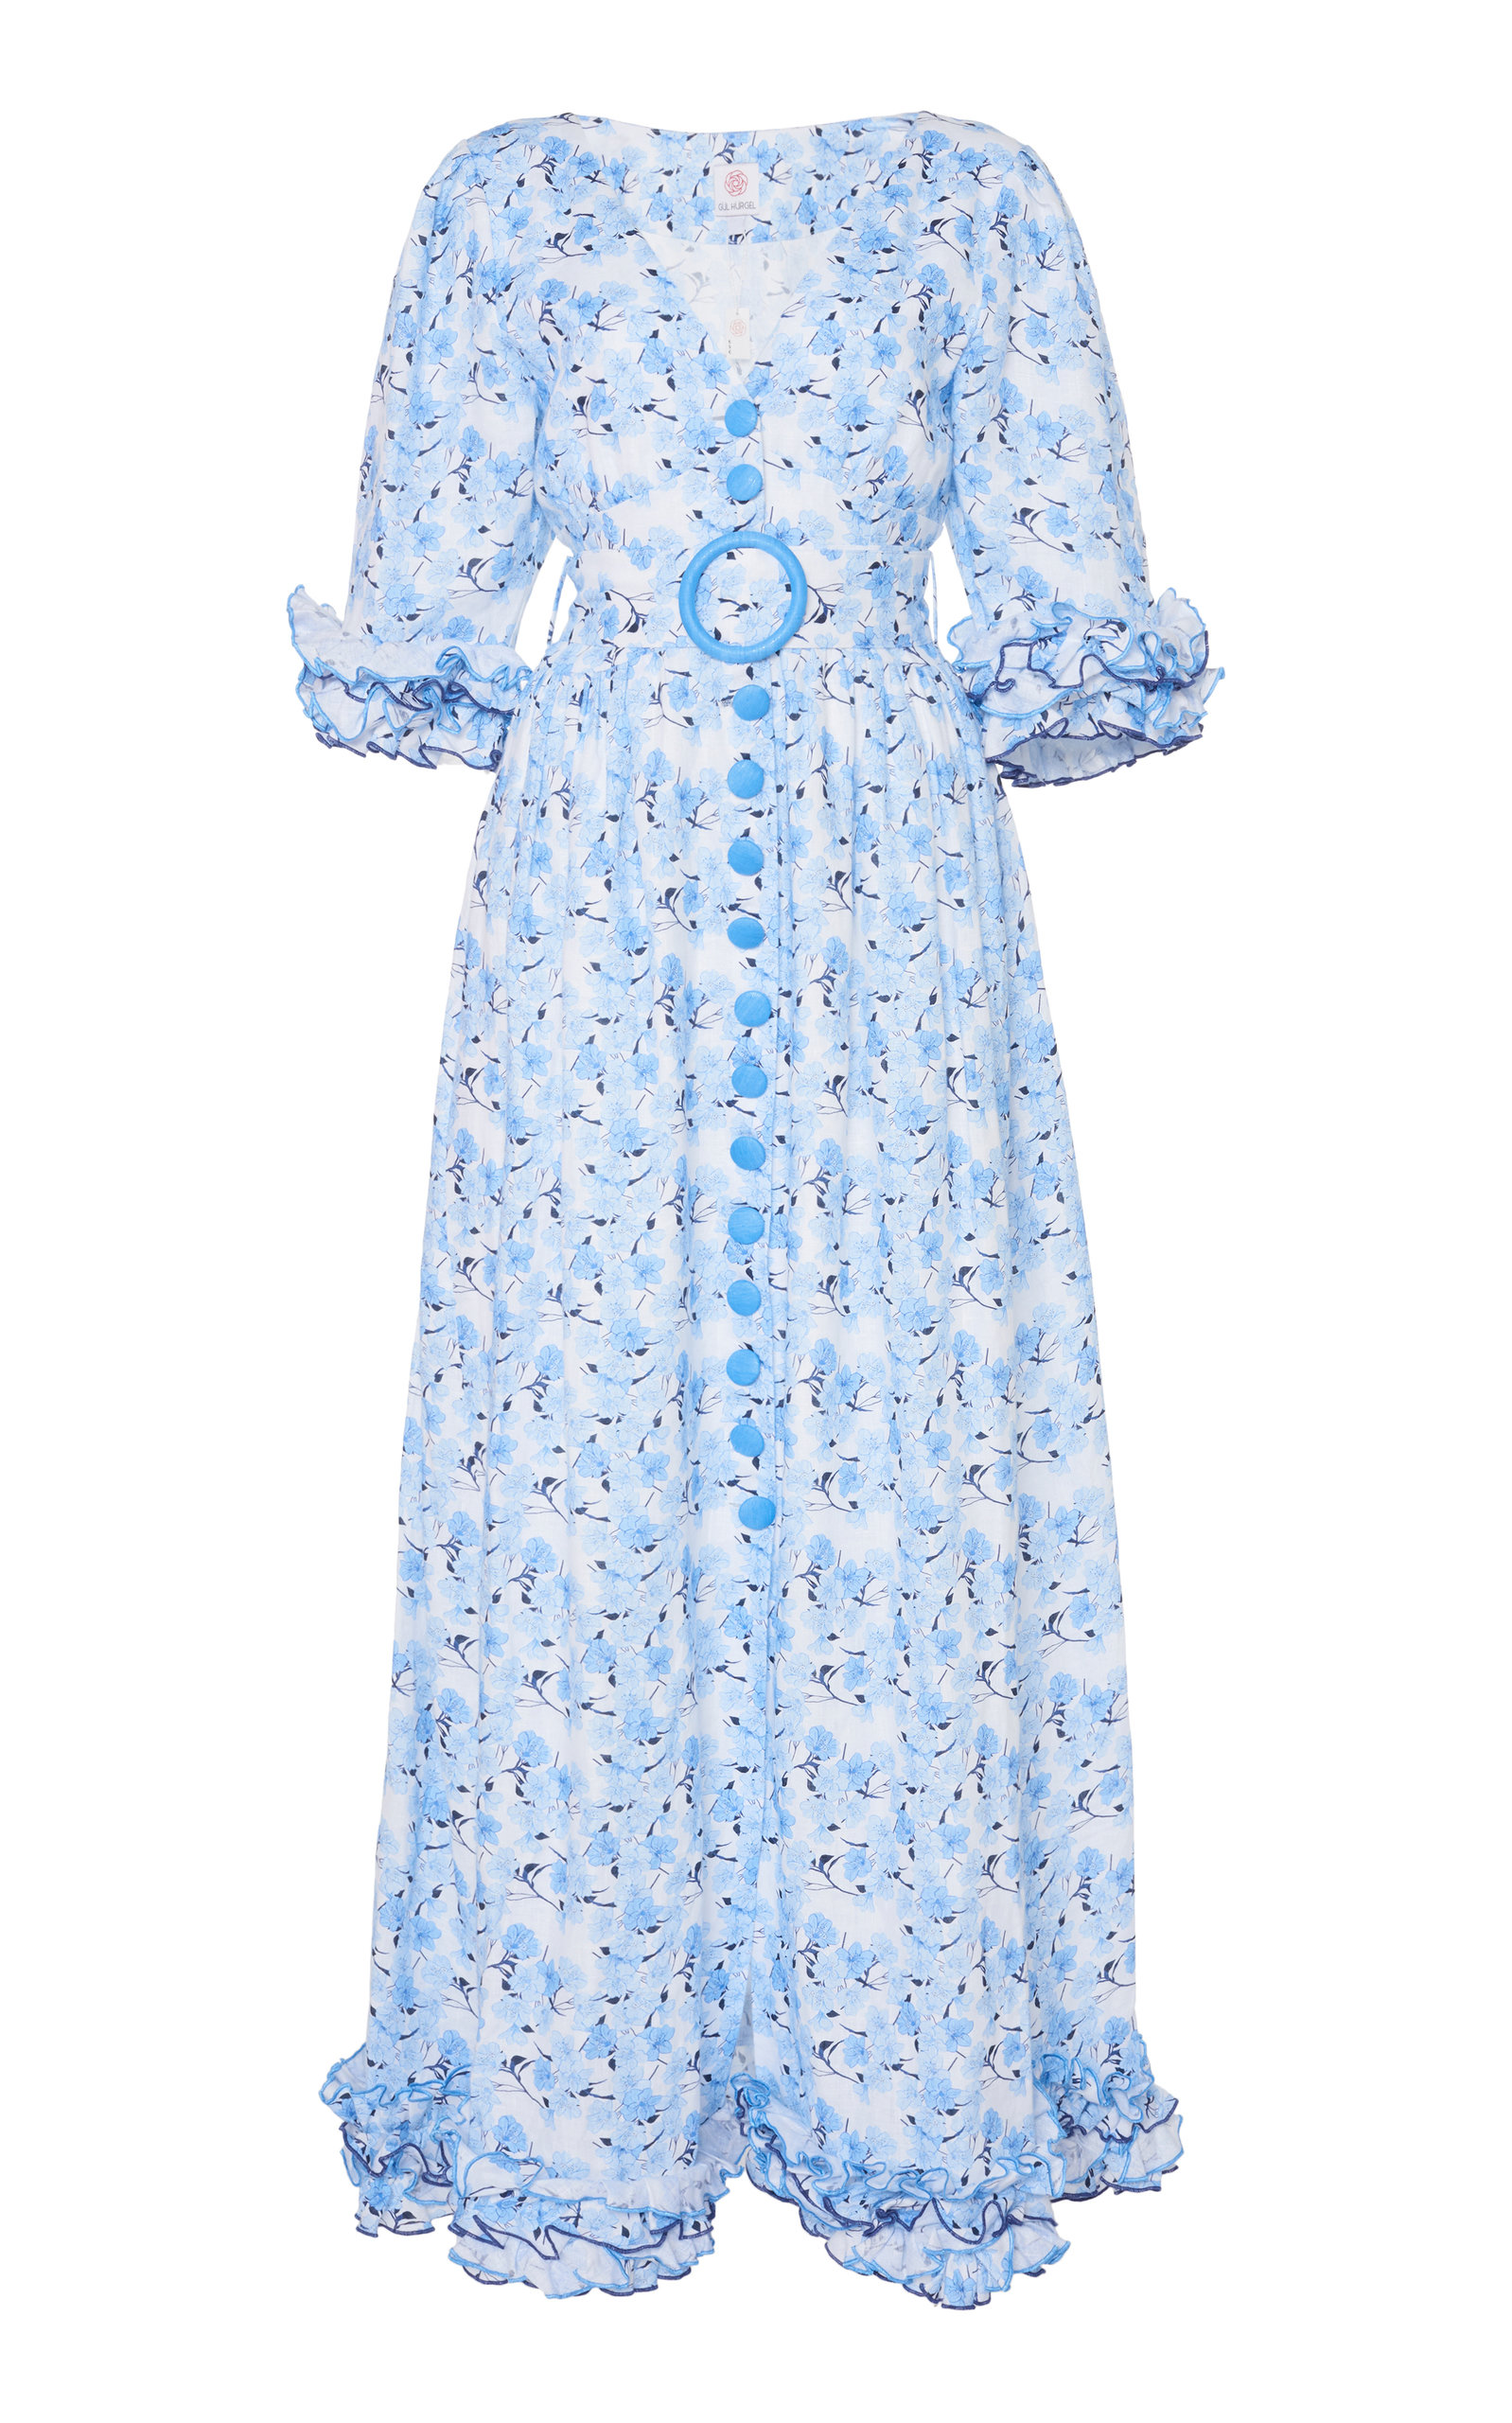 Buy Gül Hürgel Belted Ruffled Floral-Print Linen Maxi Dress online, shop Gül Hürgel at the best price